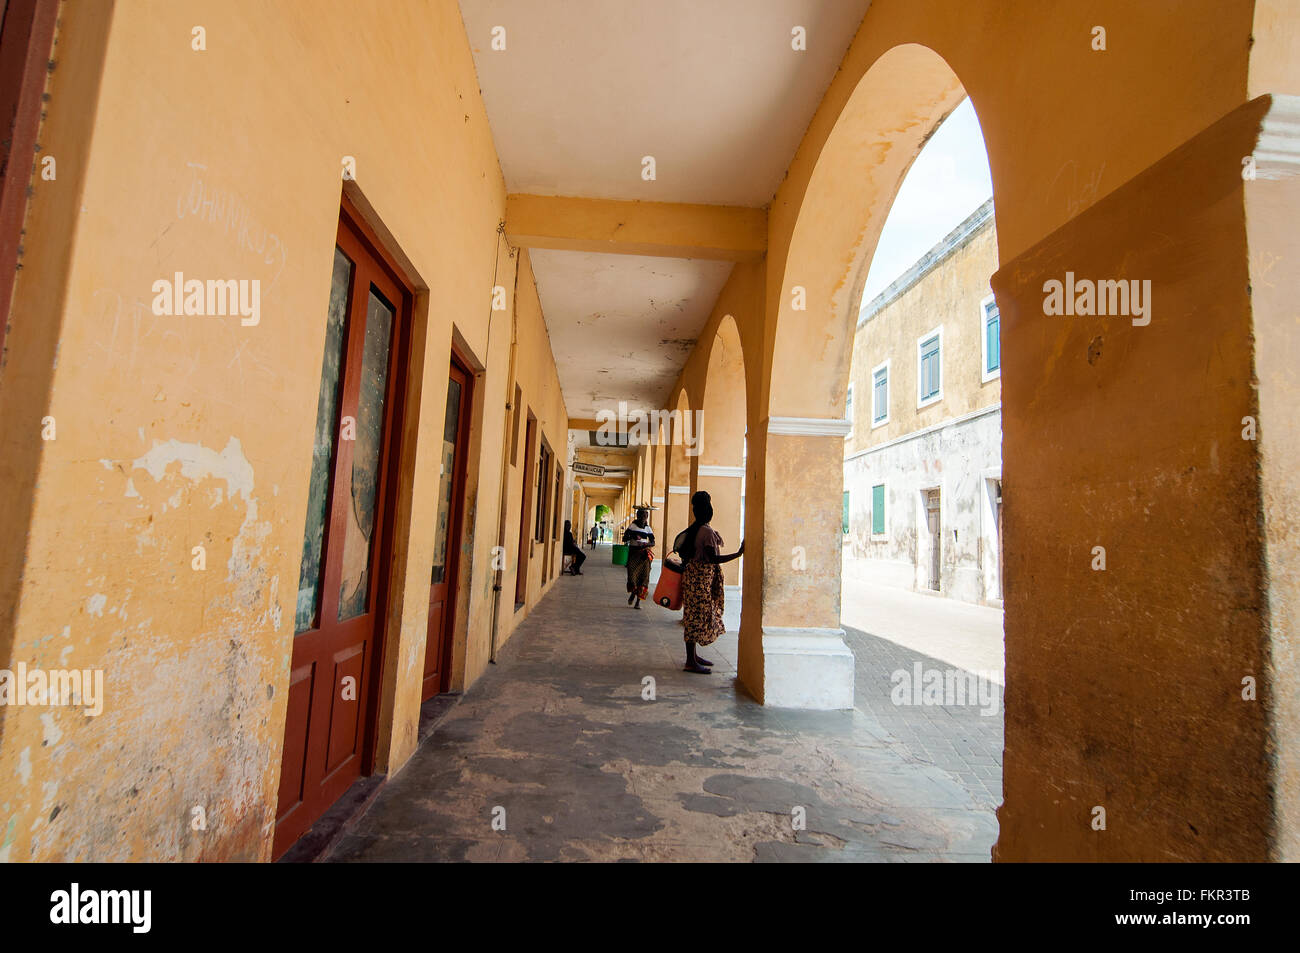 Colonial arcade, Ilha de Mozambico, Nampula, Mozambico Immagini Stock